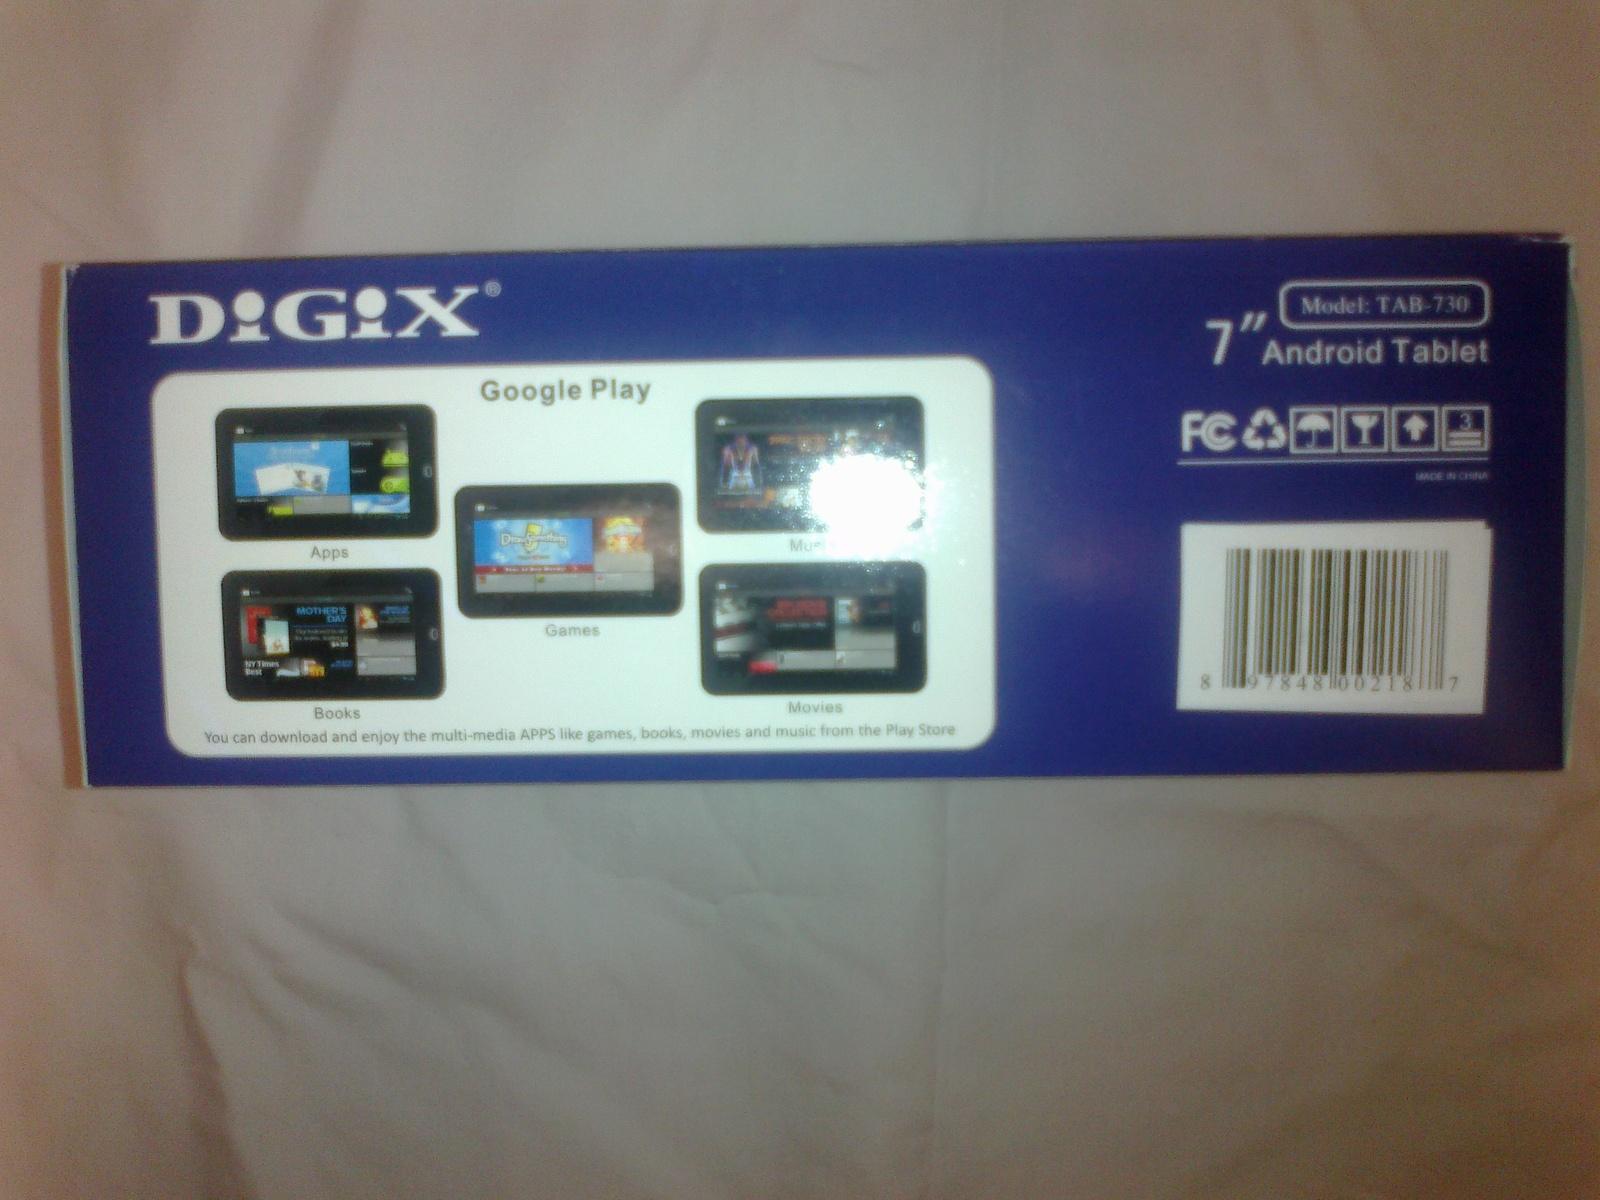 Digix Tab-730 7